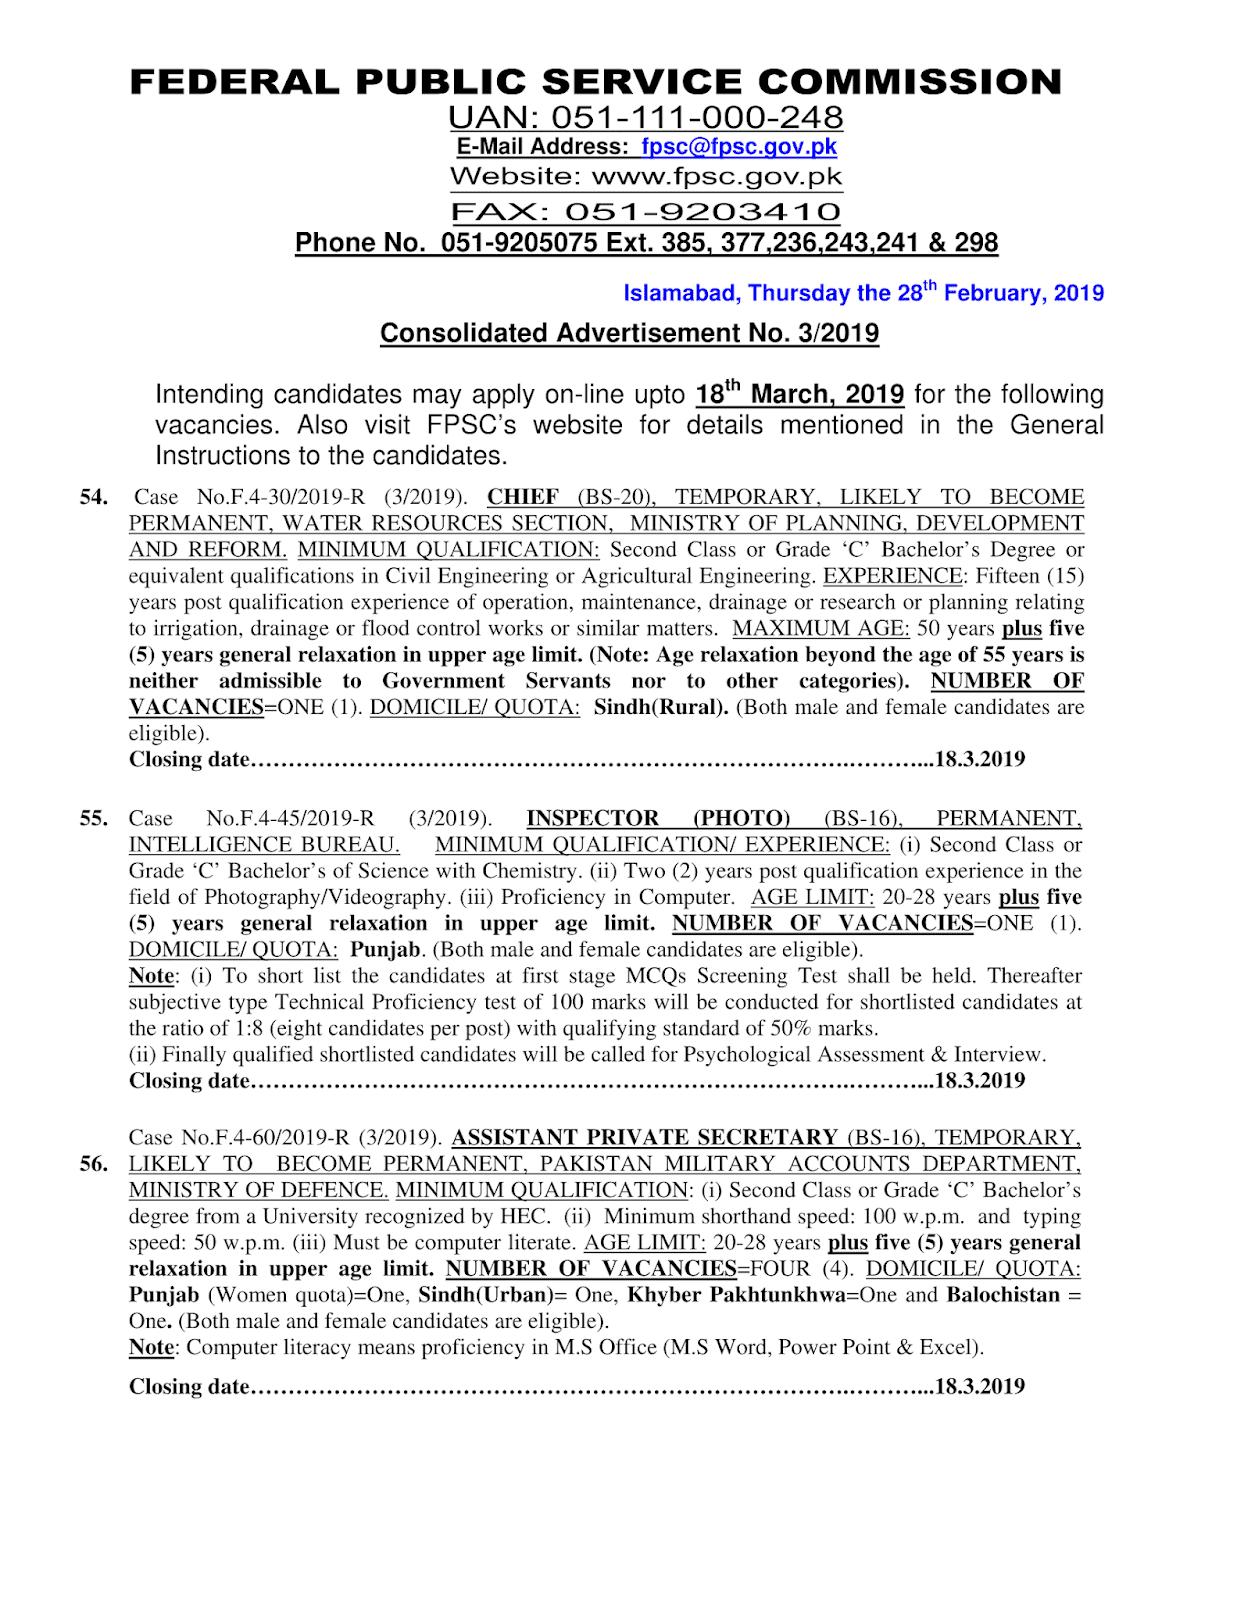 FPSC Advertisement 03/2019 Page No. 1/7